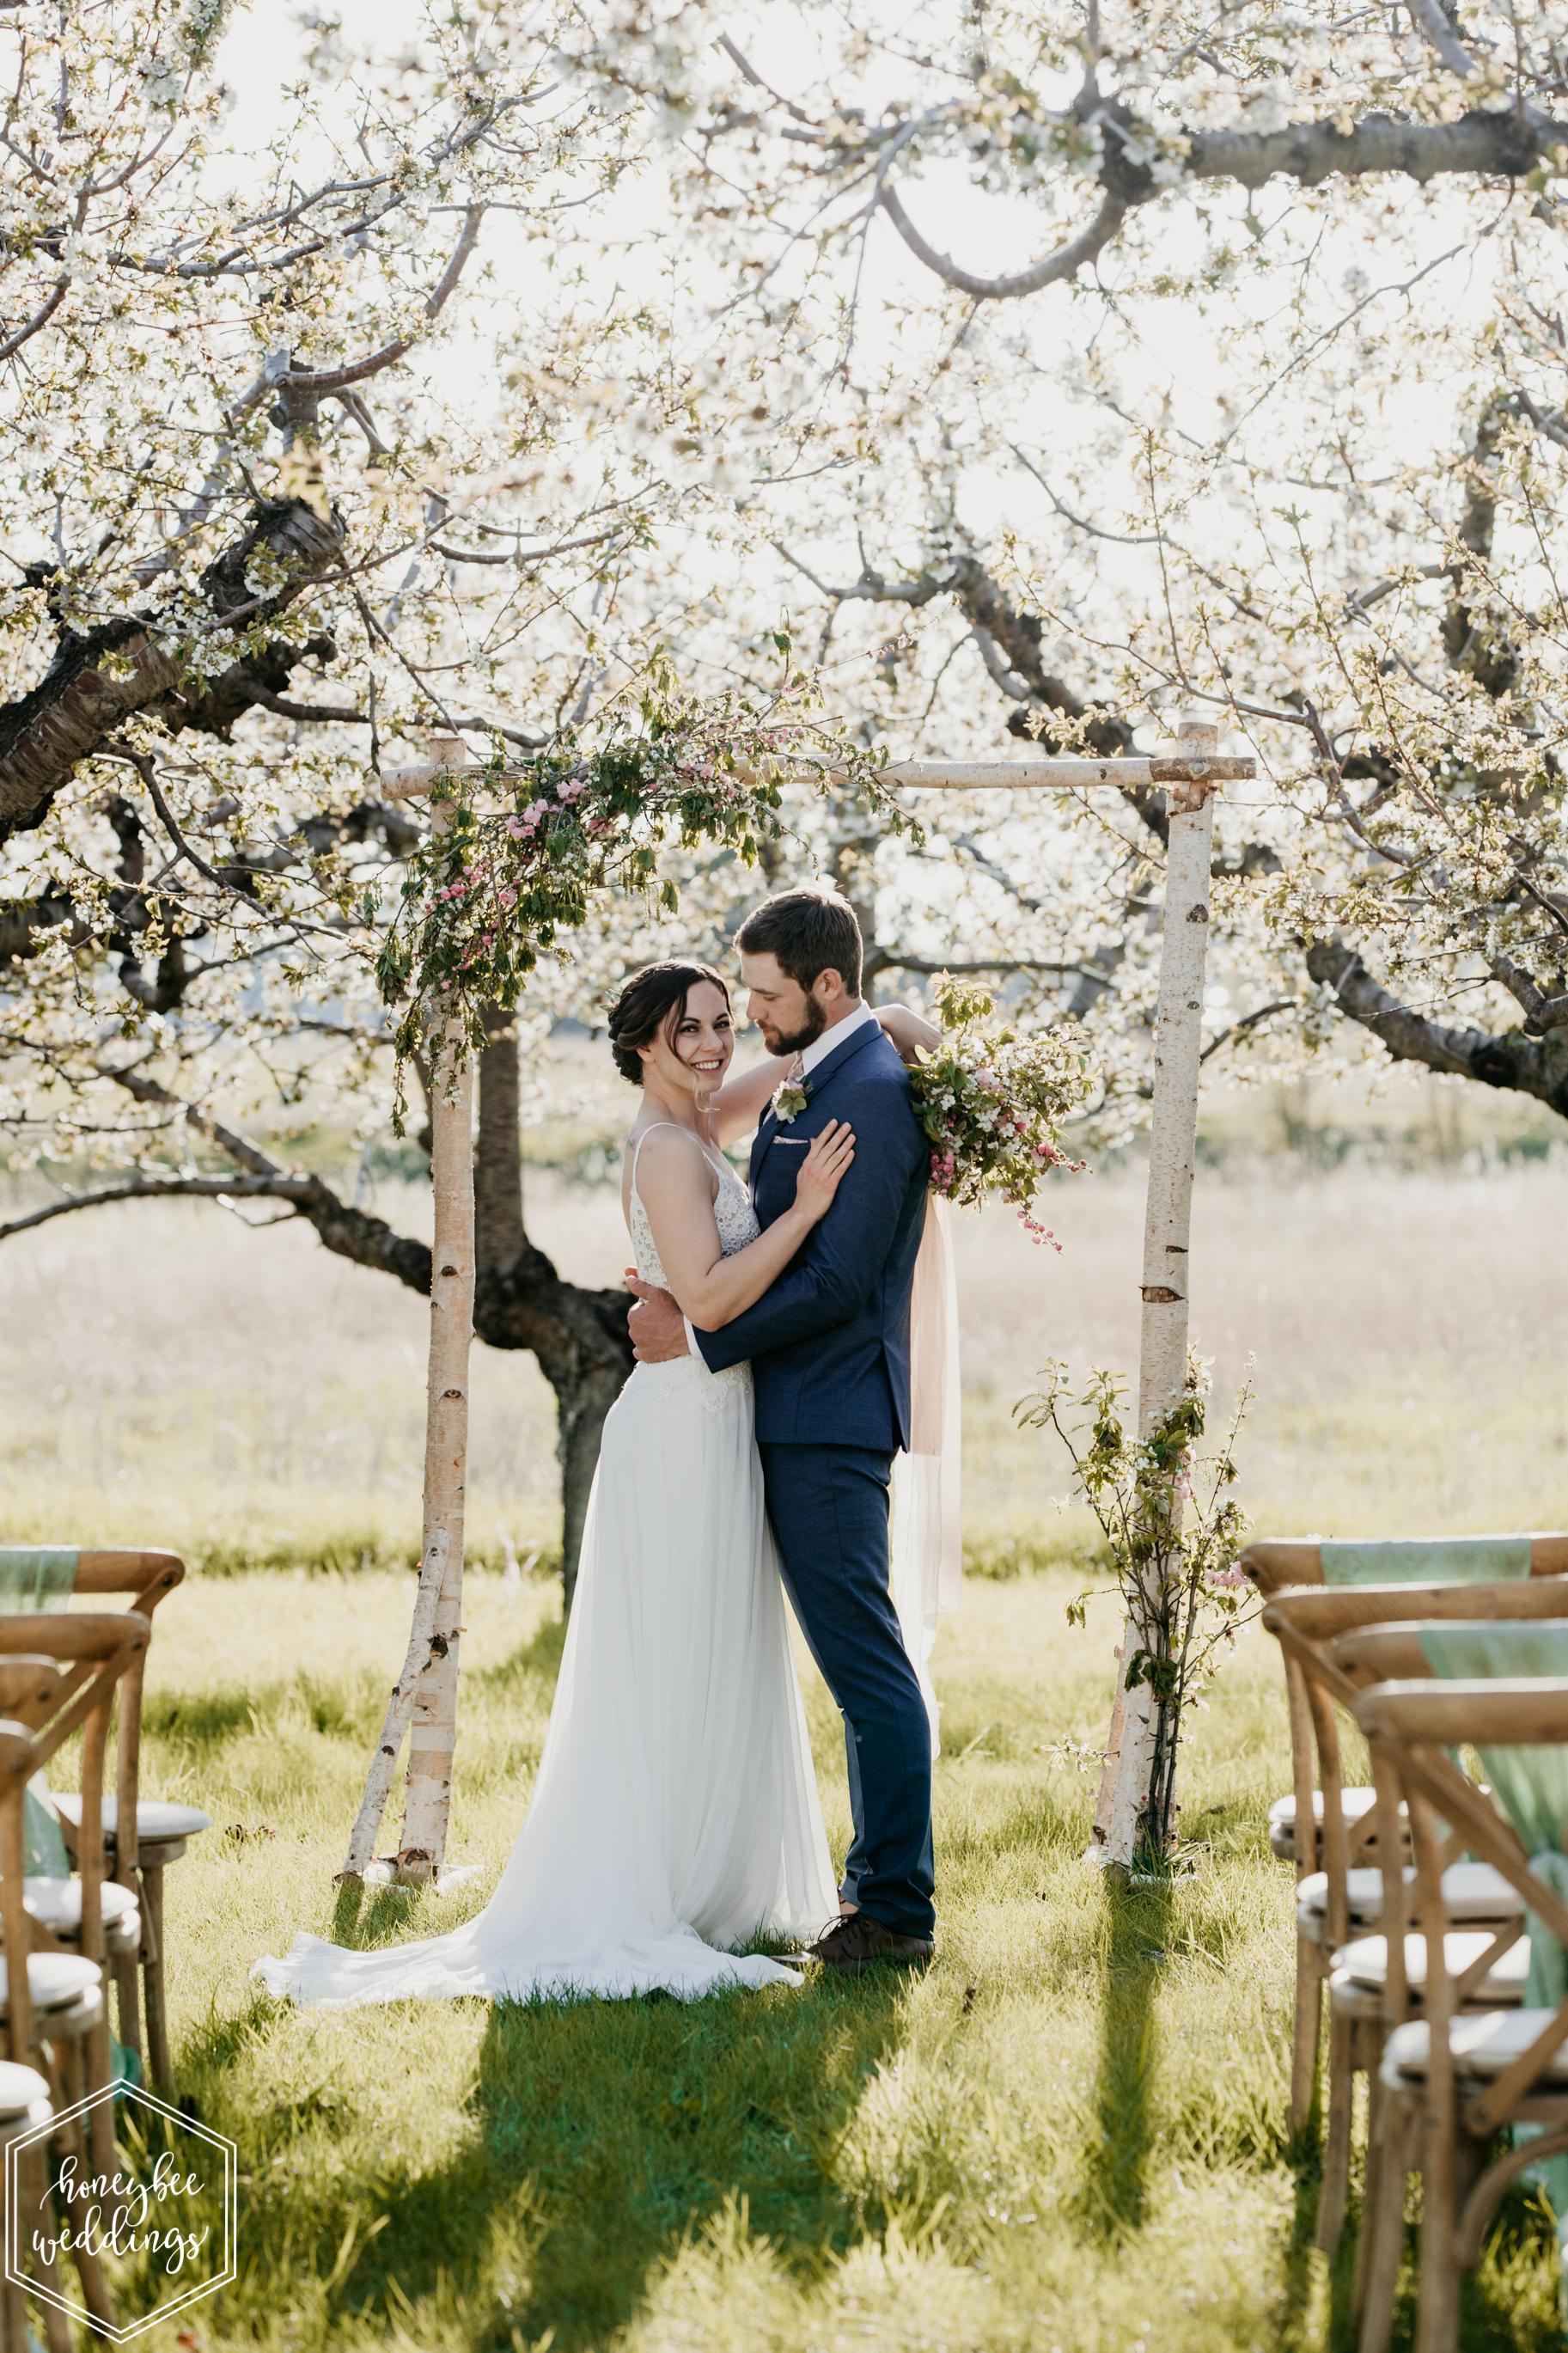 047Cherry Blossom Wedding_Styled Photoshoot_Honeybee Weddings_May 11, 2019-399.jpg